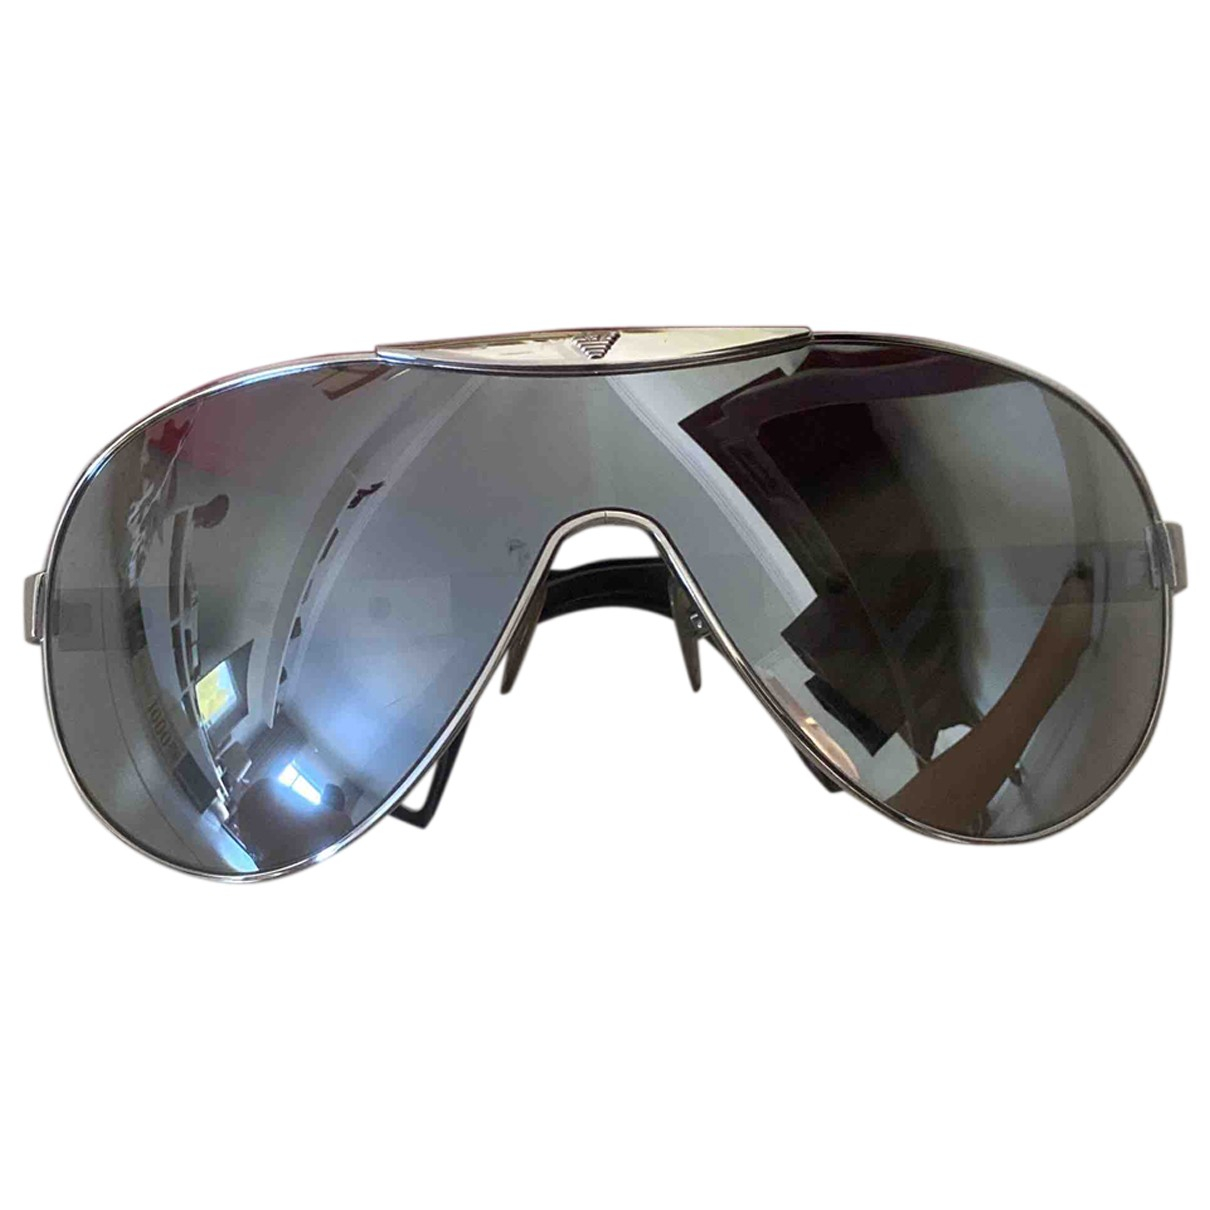 Emporio Armani \N Silver Metal Sunglasses for Women \N